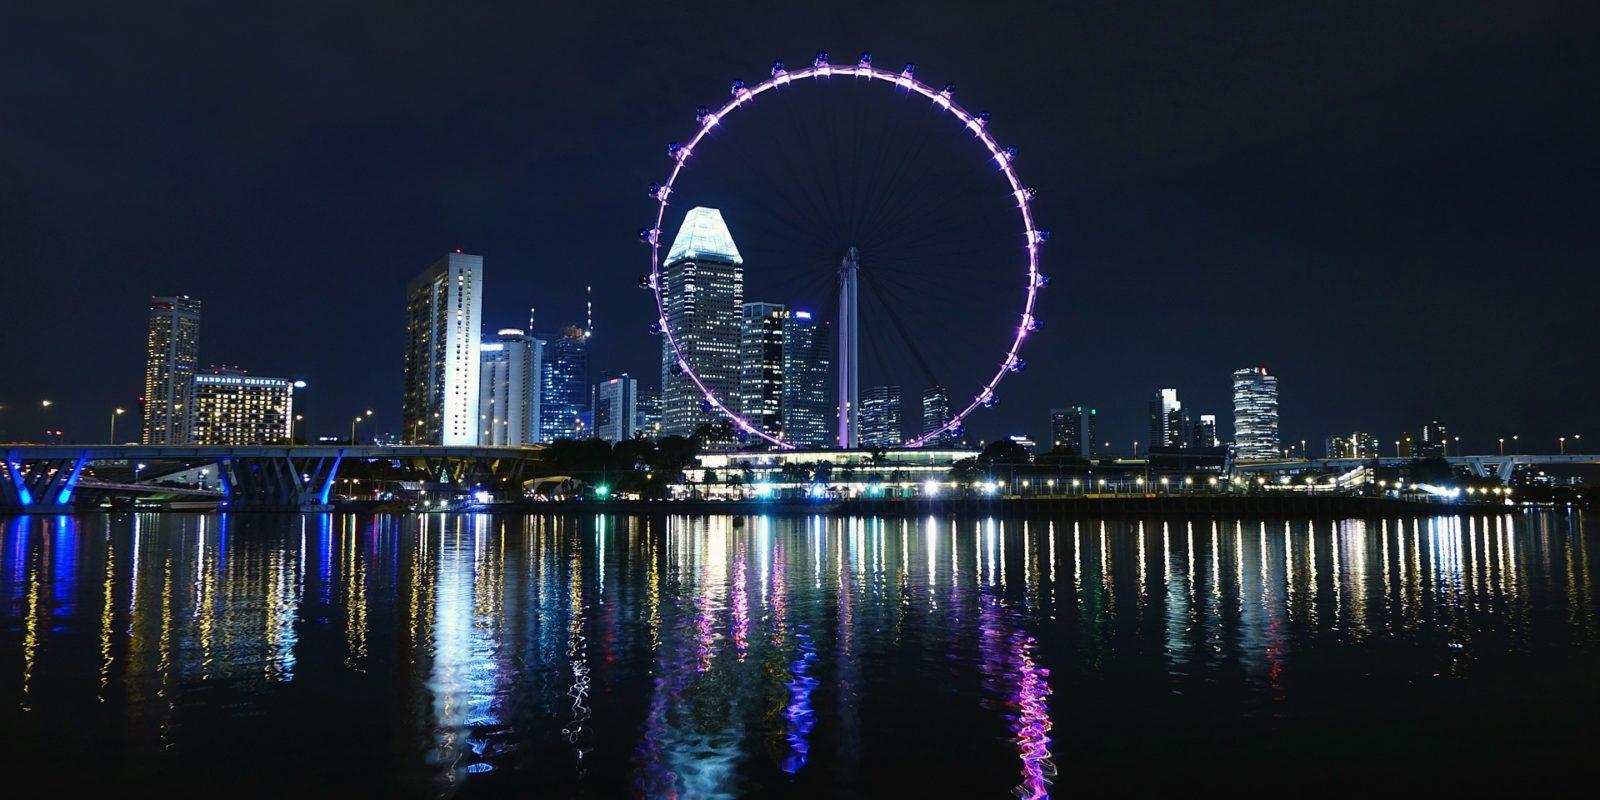 Singapore night skyline with Big Ferris Wheel